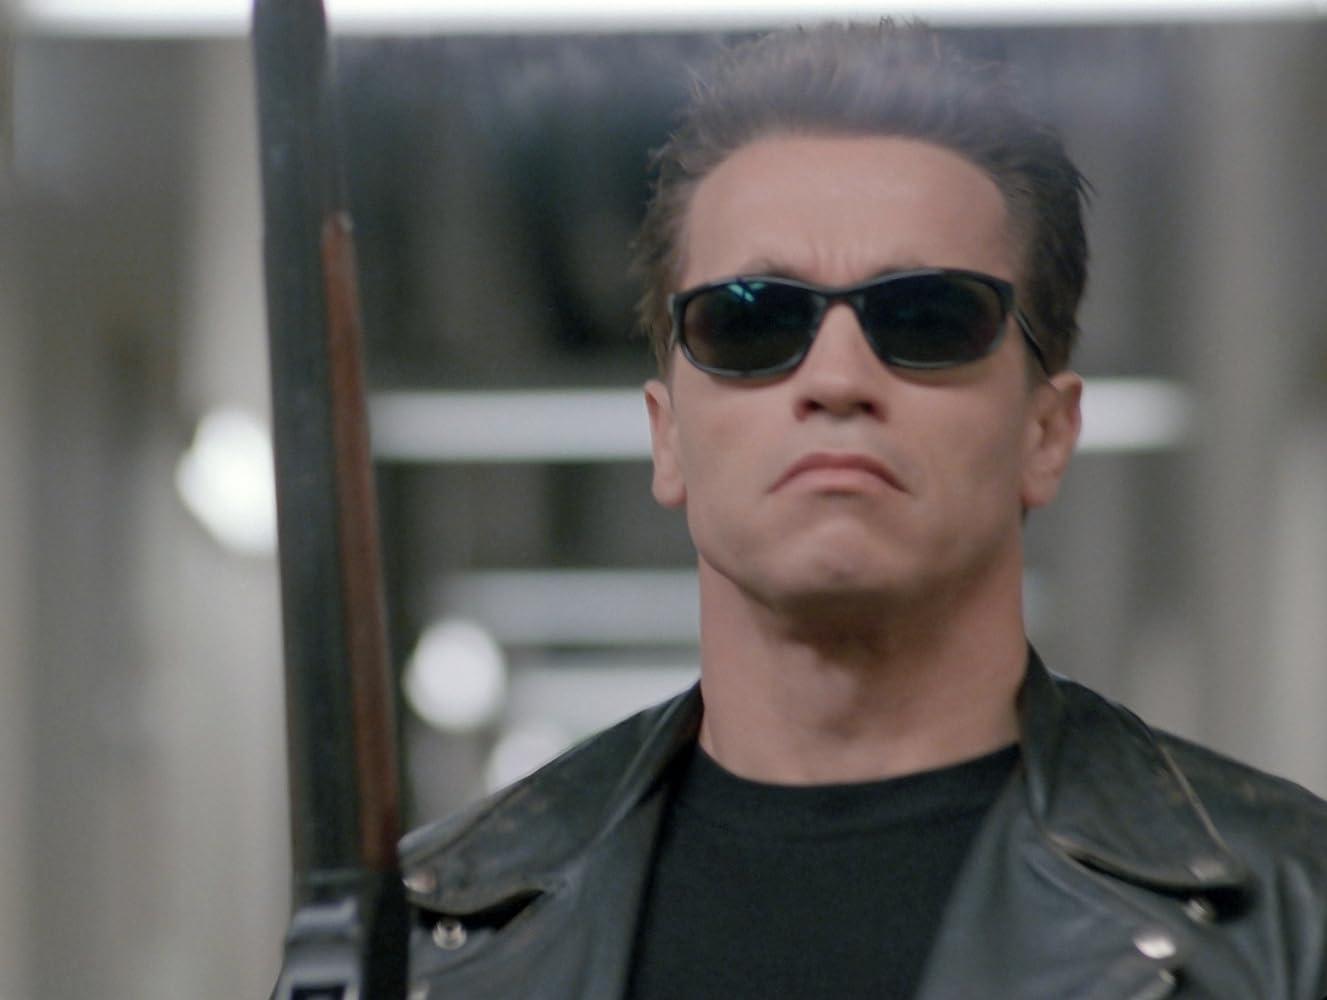 712aff6b723 Arnold Schwarzenegger in Terminator 2: Judgment Day (1991)